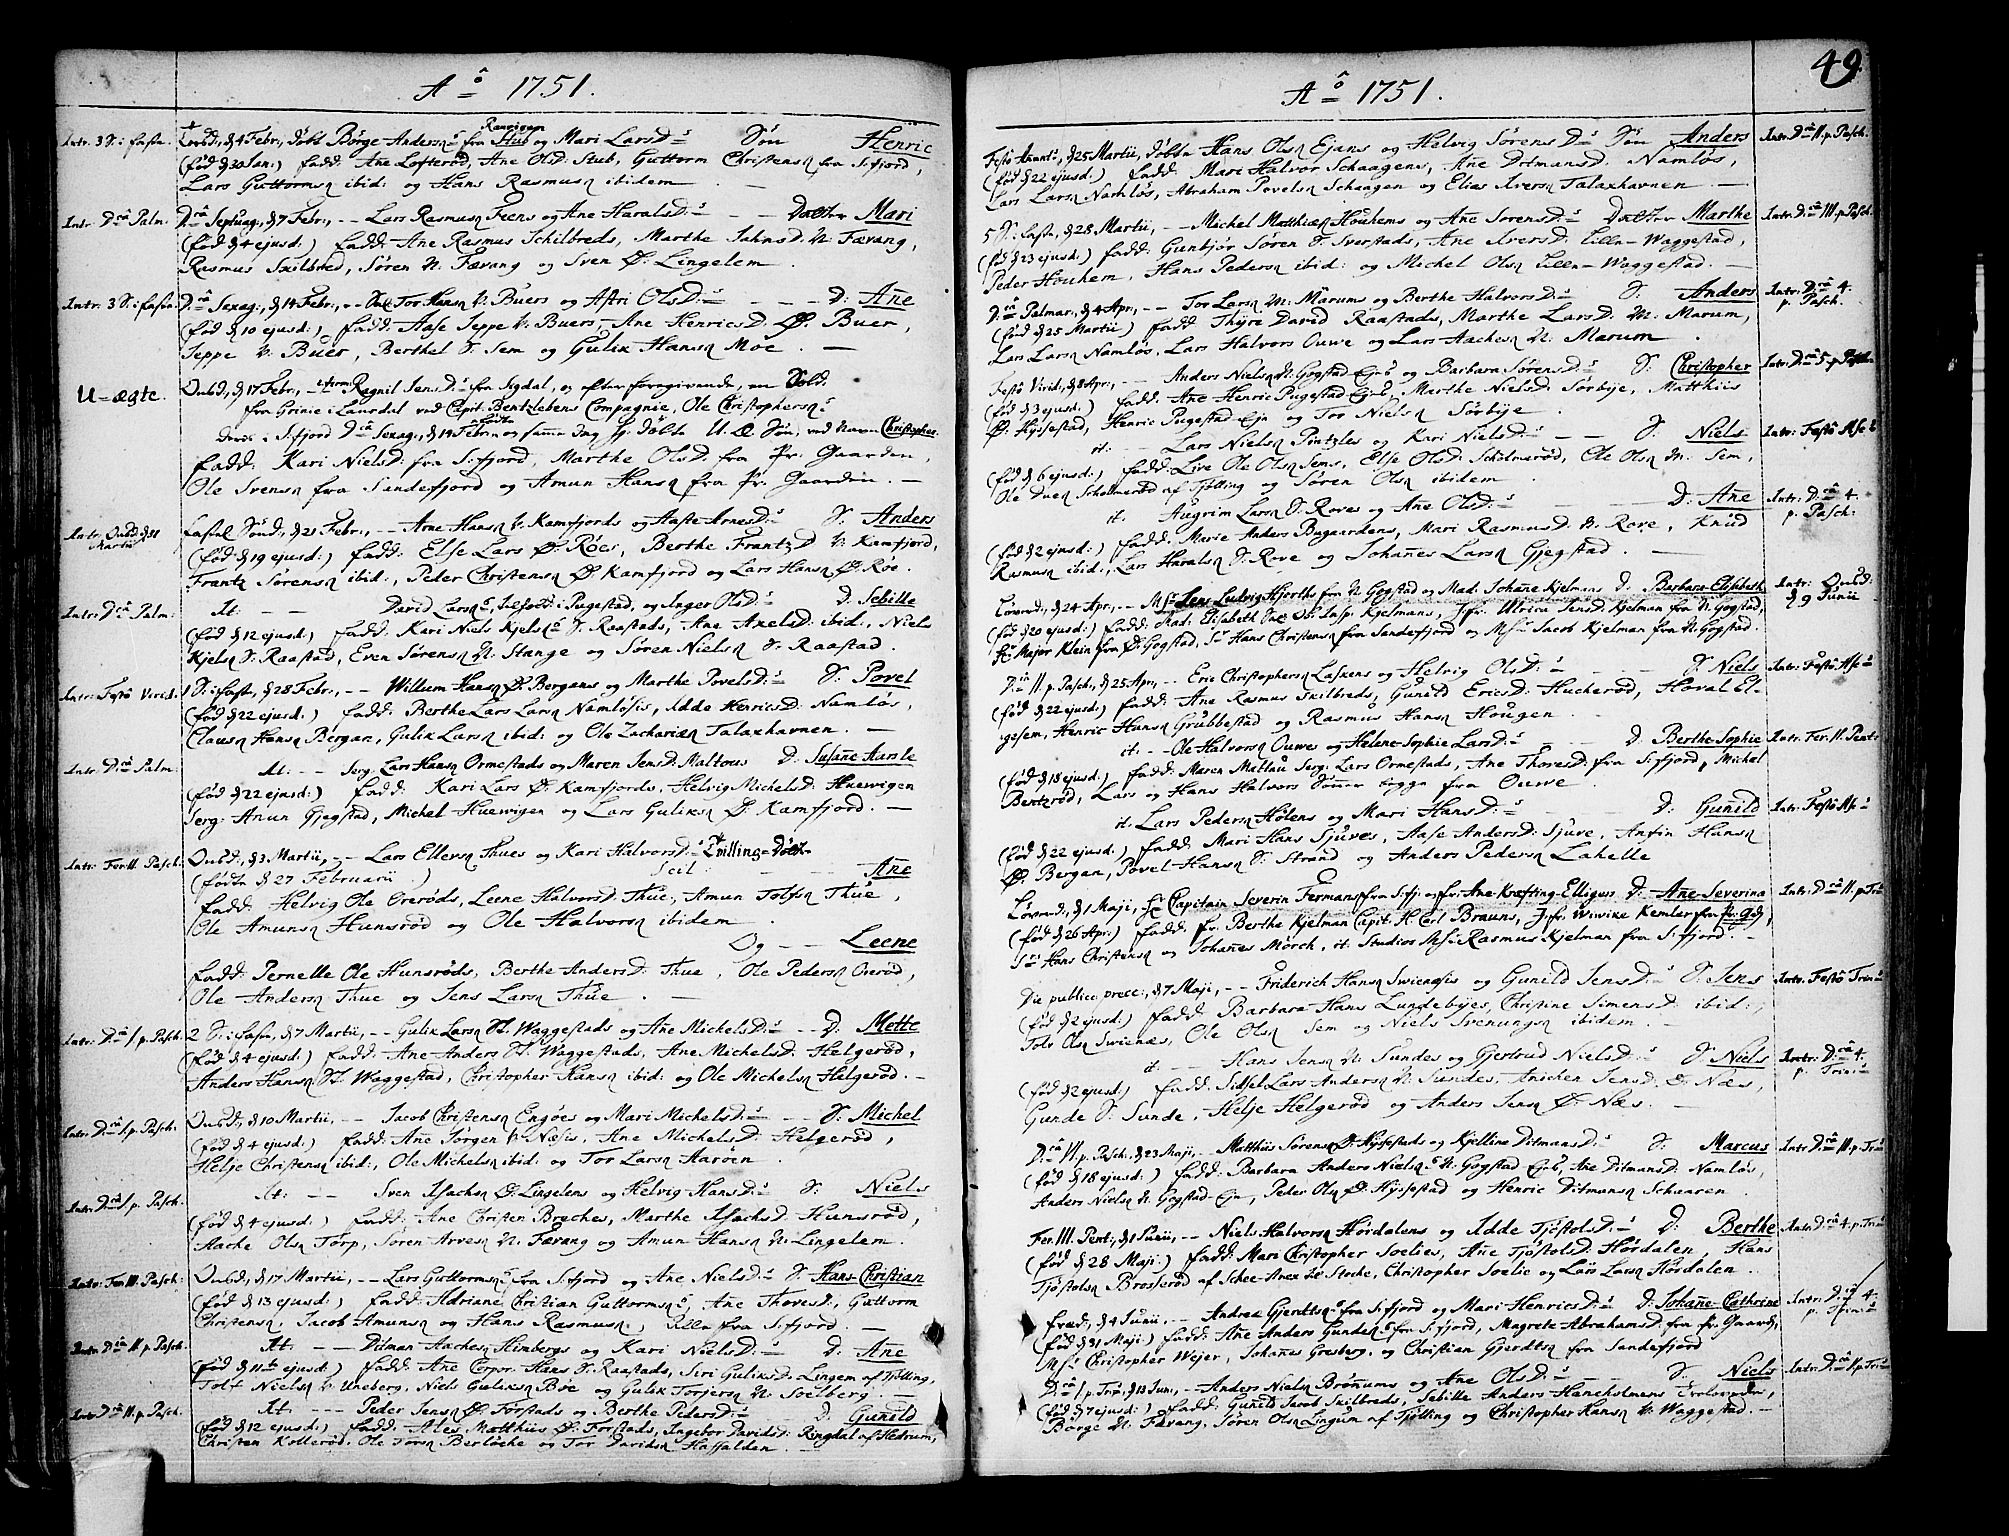 SAKO, Sandar kirkebøker, F/Fa/L0002: Parish register (official) no. 2, 1733-1788, p. 49